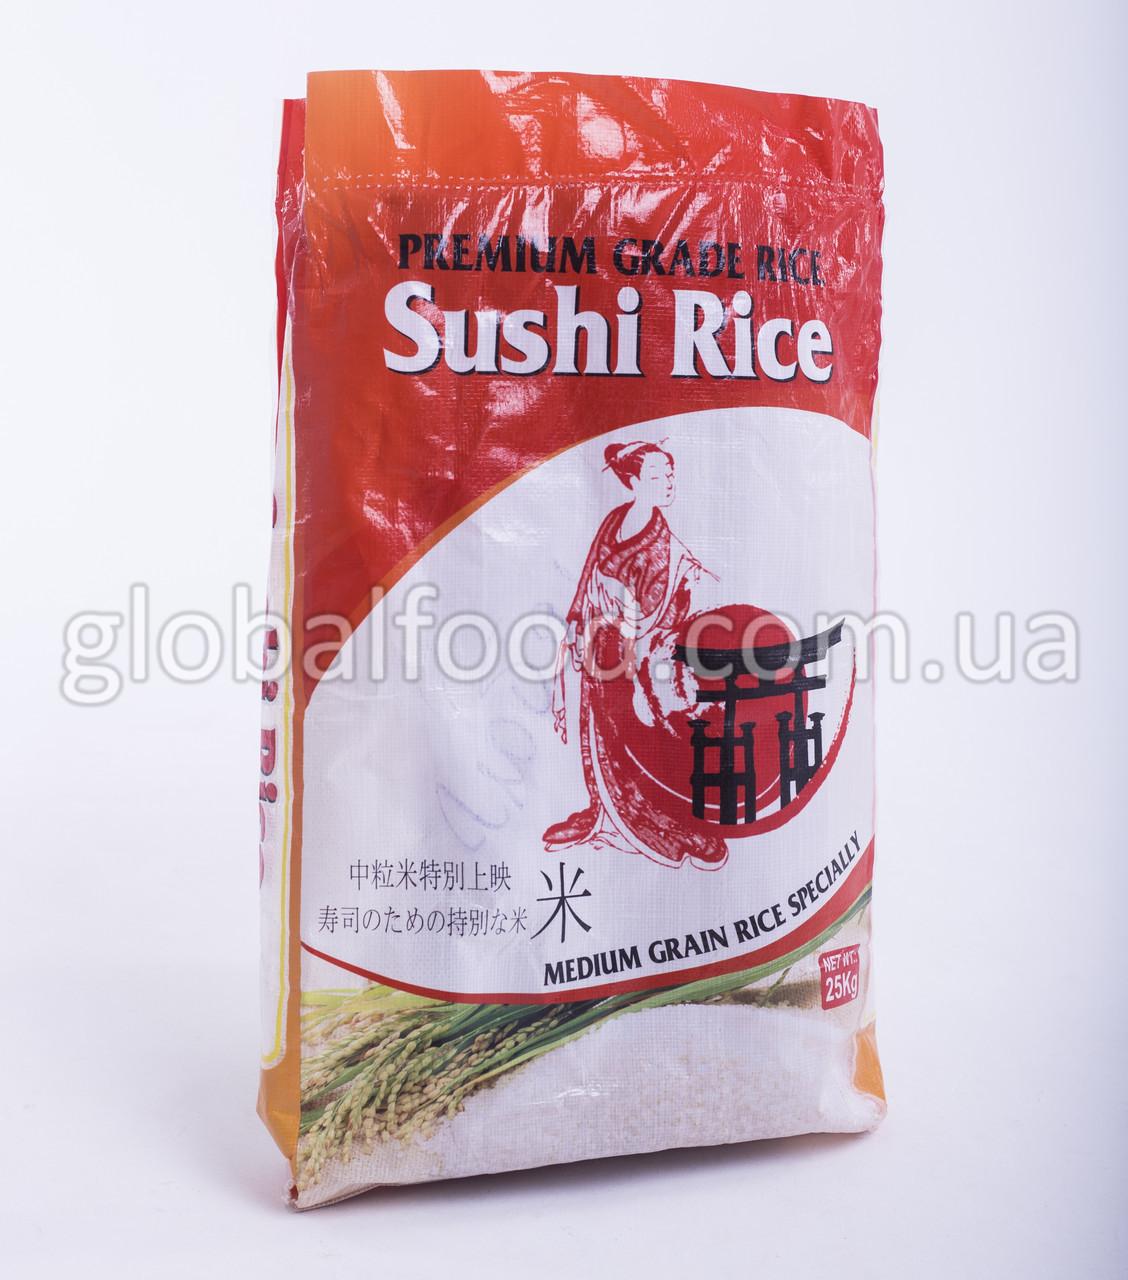 Рис для Суши (Sushi Ricei) (5 кг.)